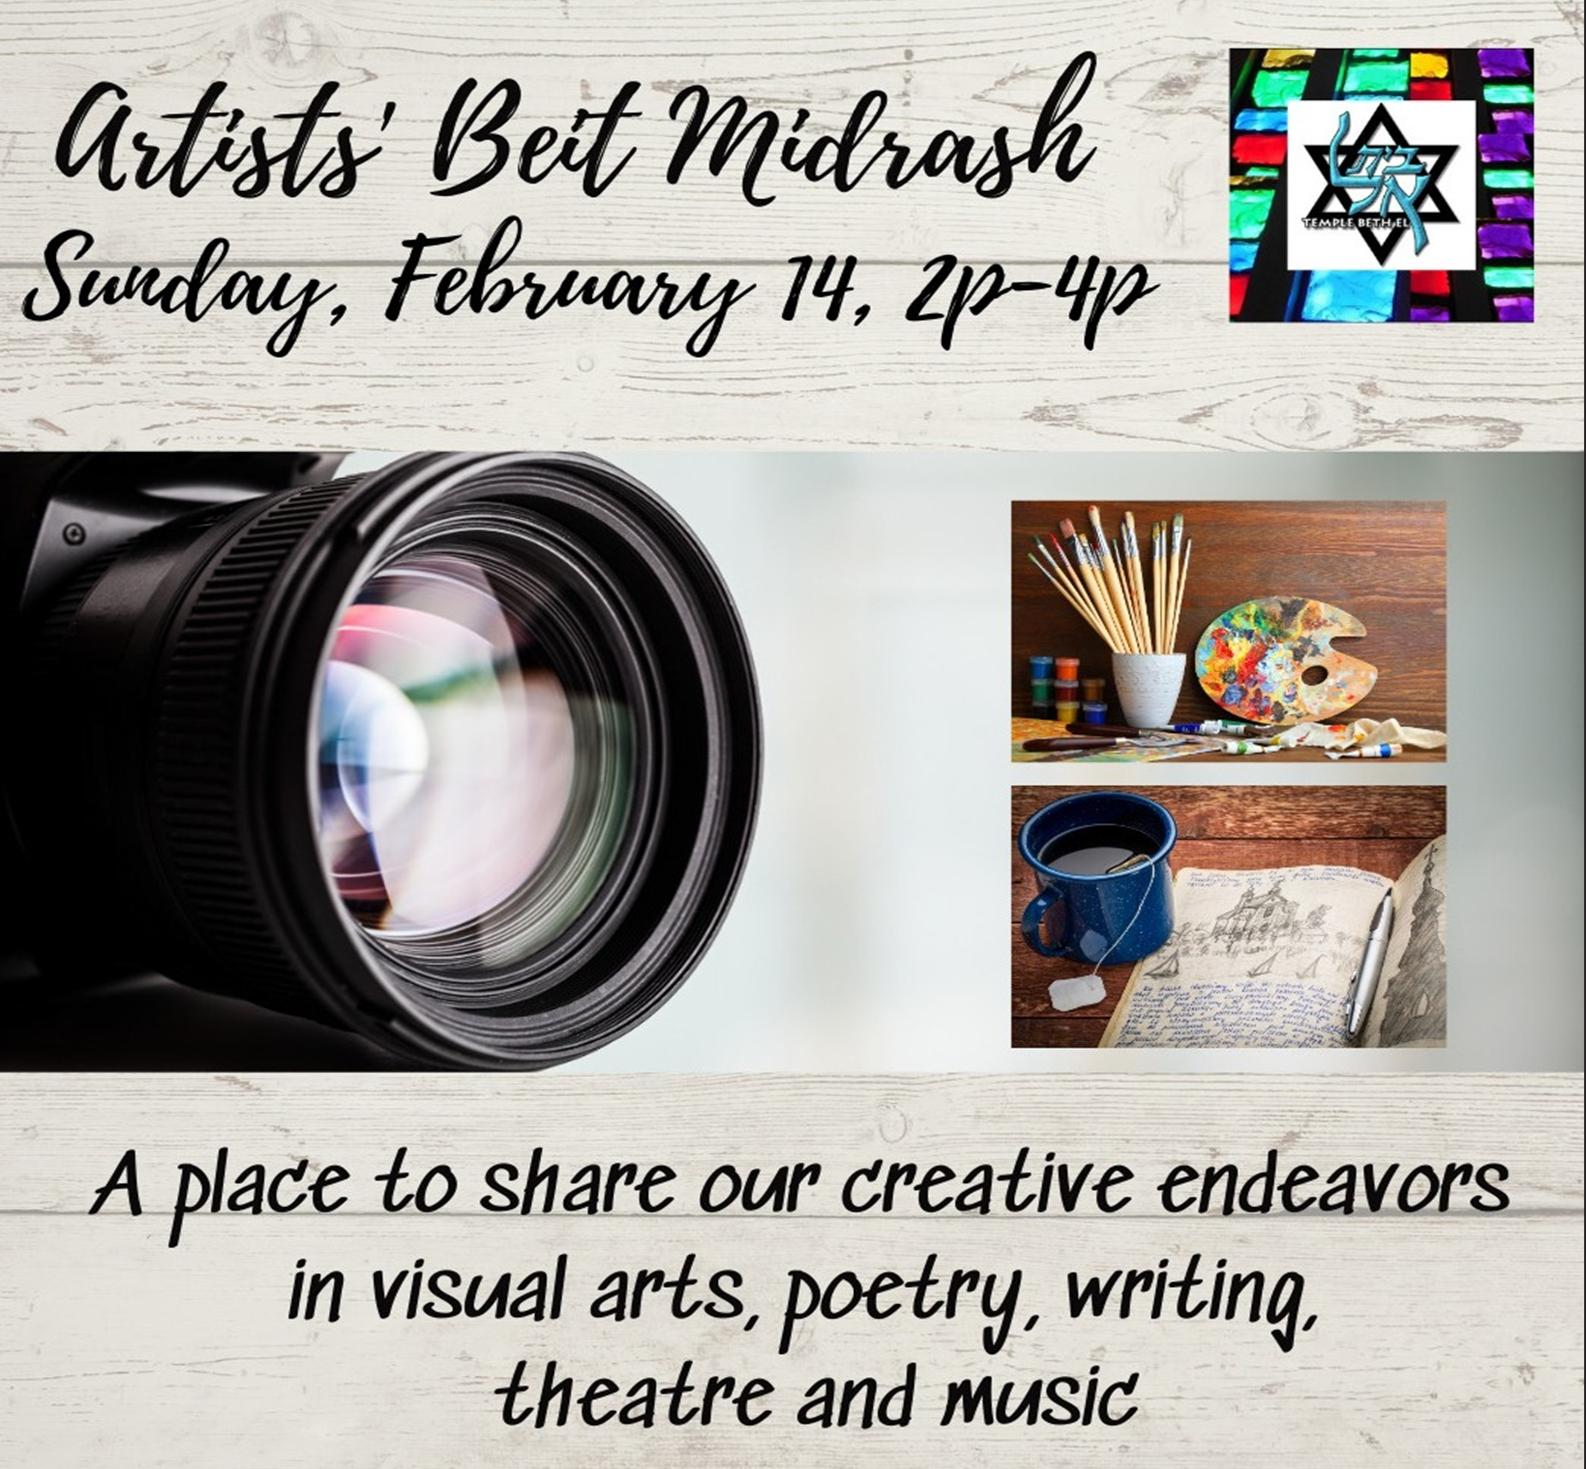 Artists Beit Midrash-Feb 14 2021